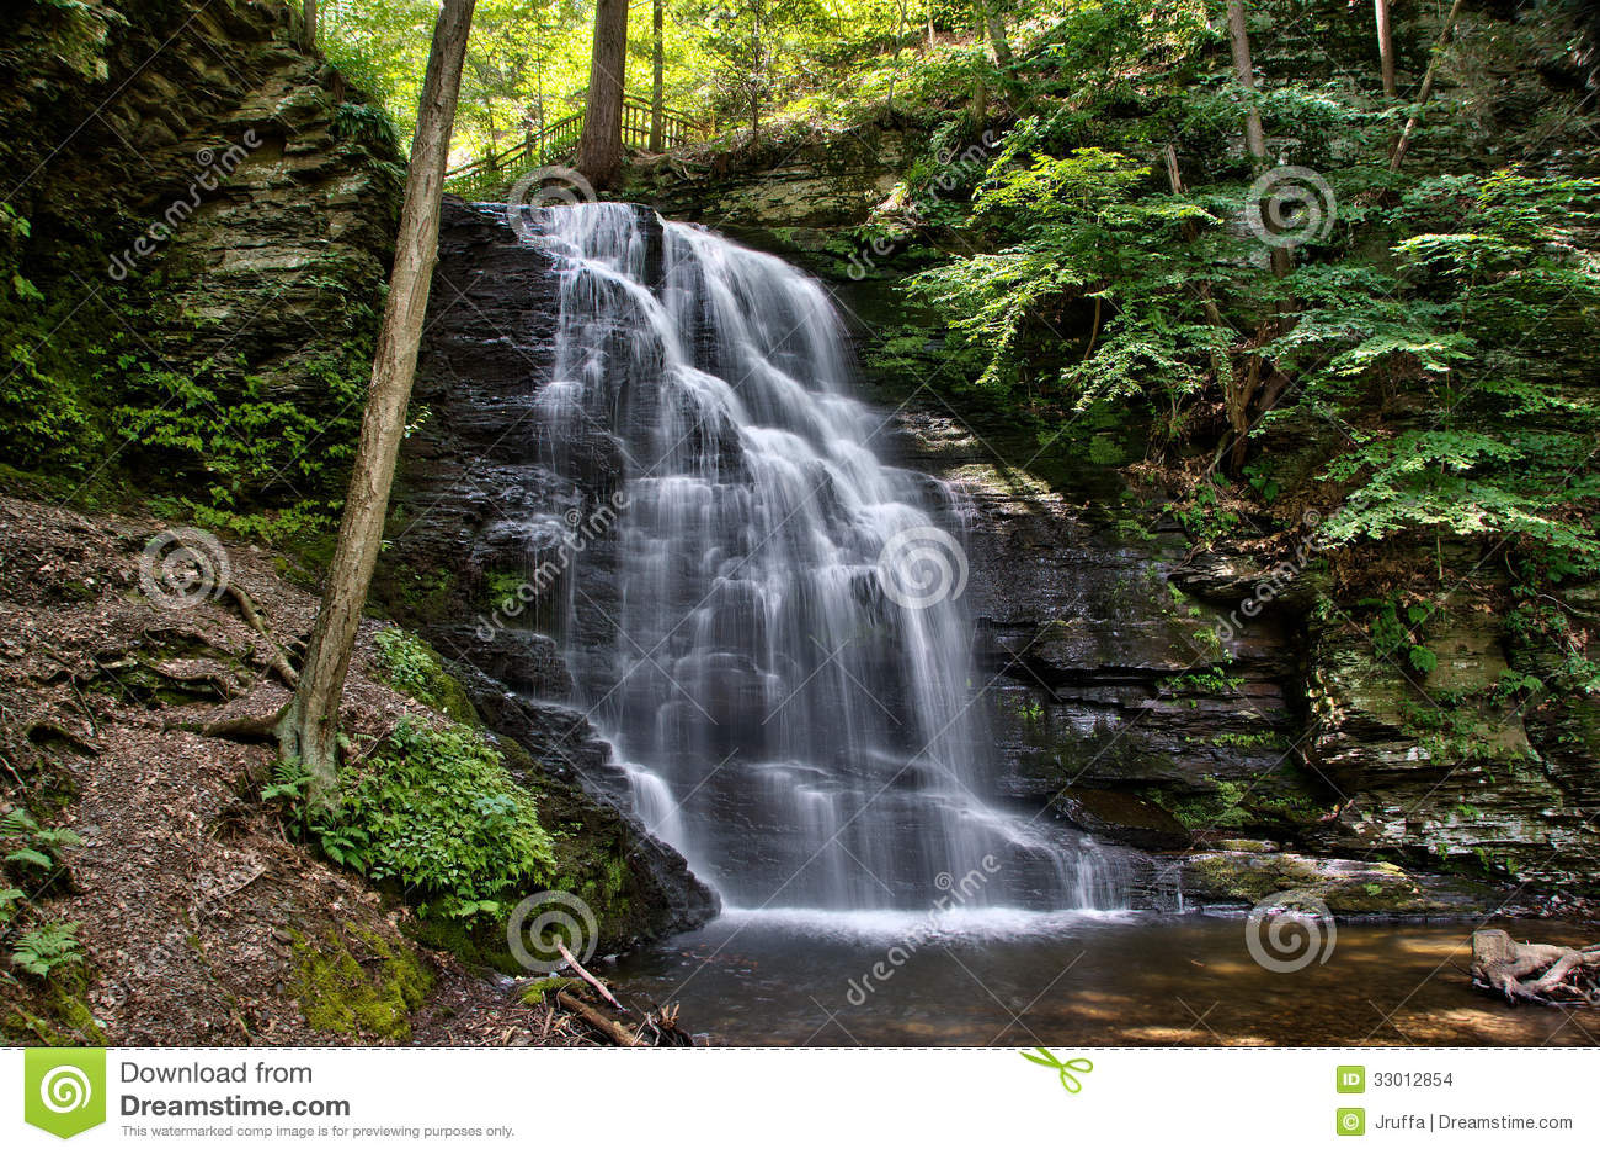 bridal veil falls one of the waterfalls of bushkill falls in the ...